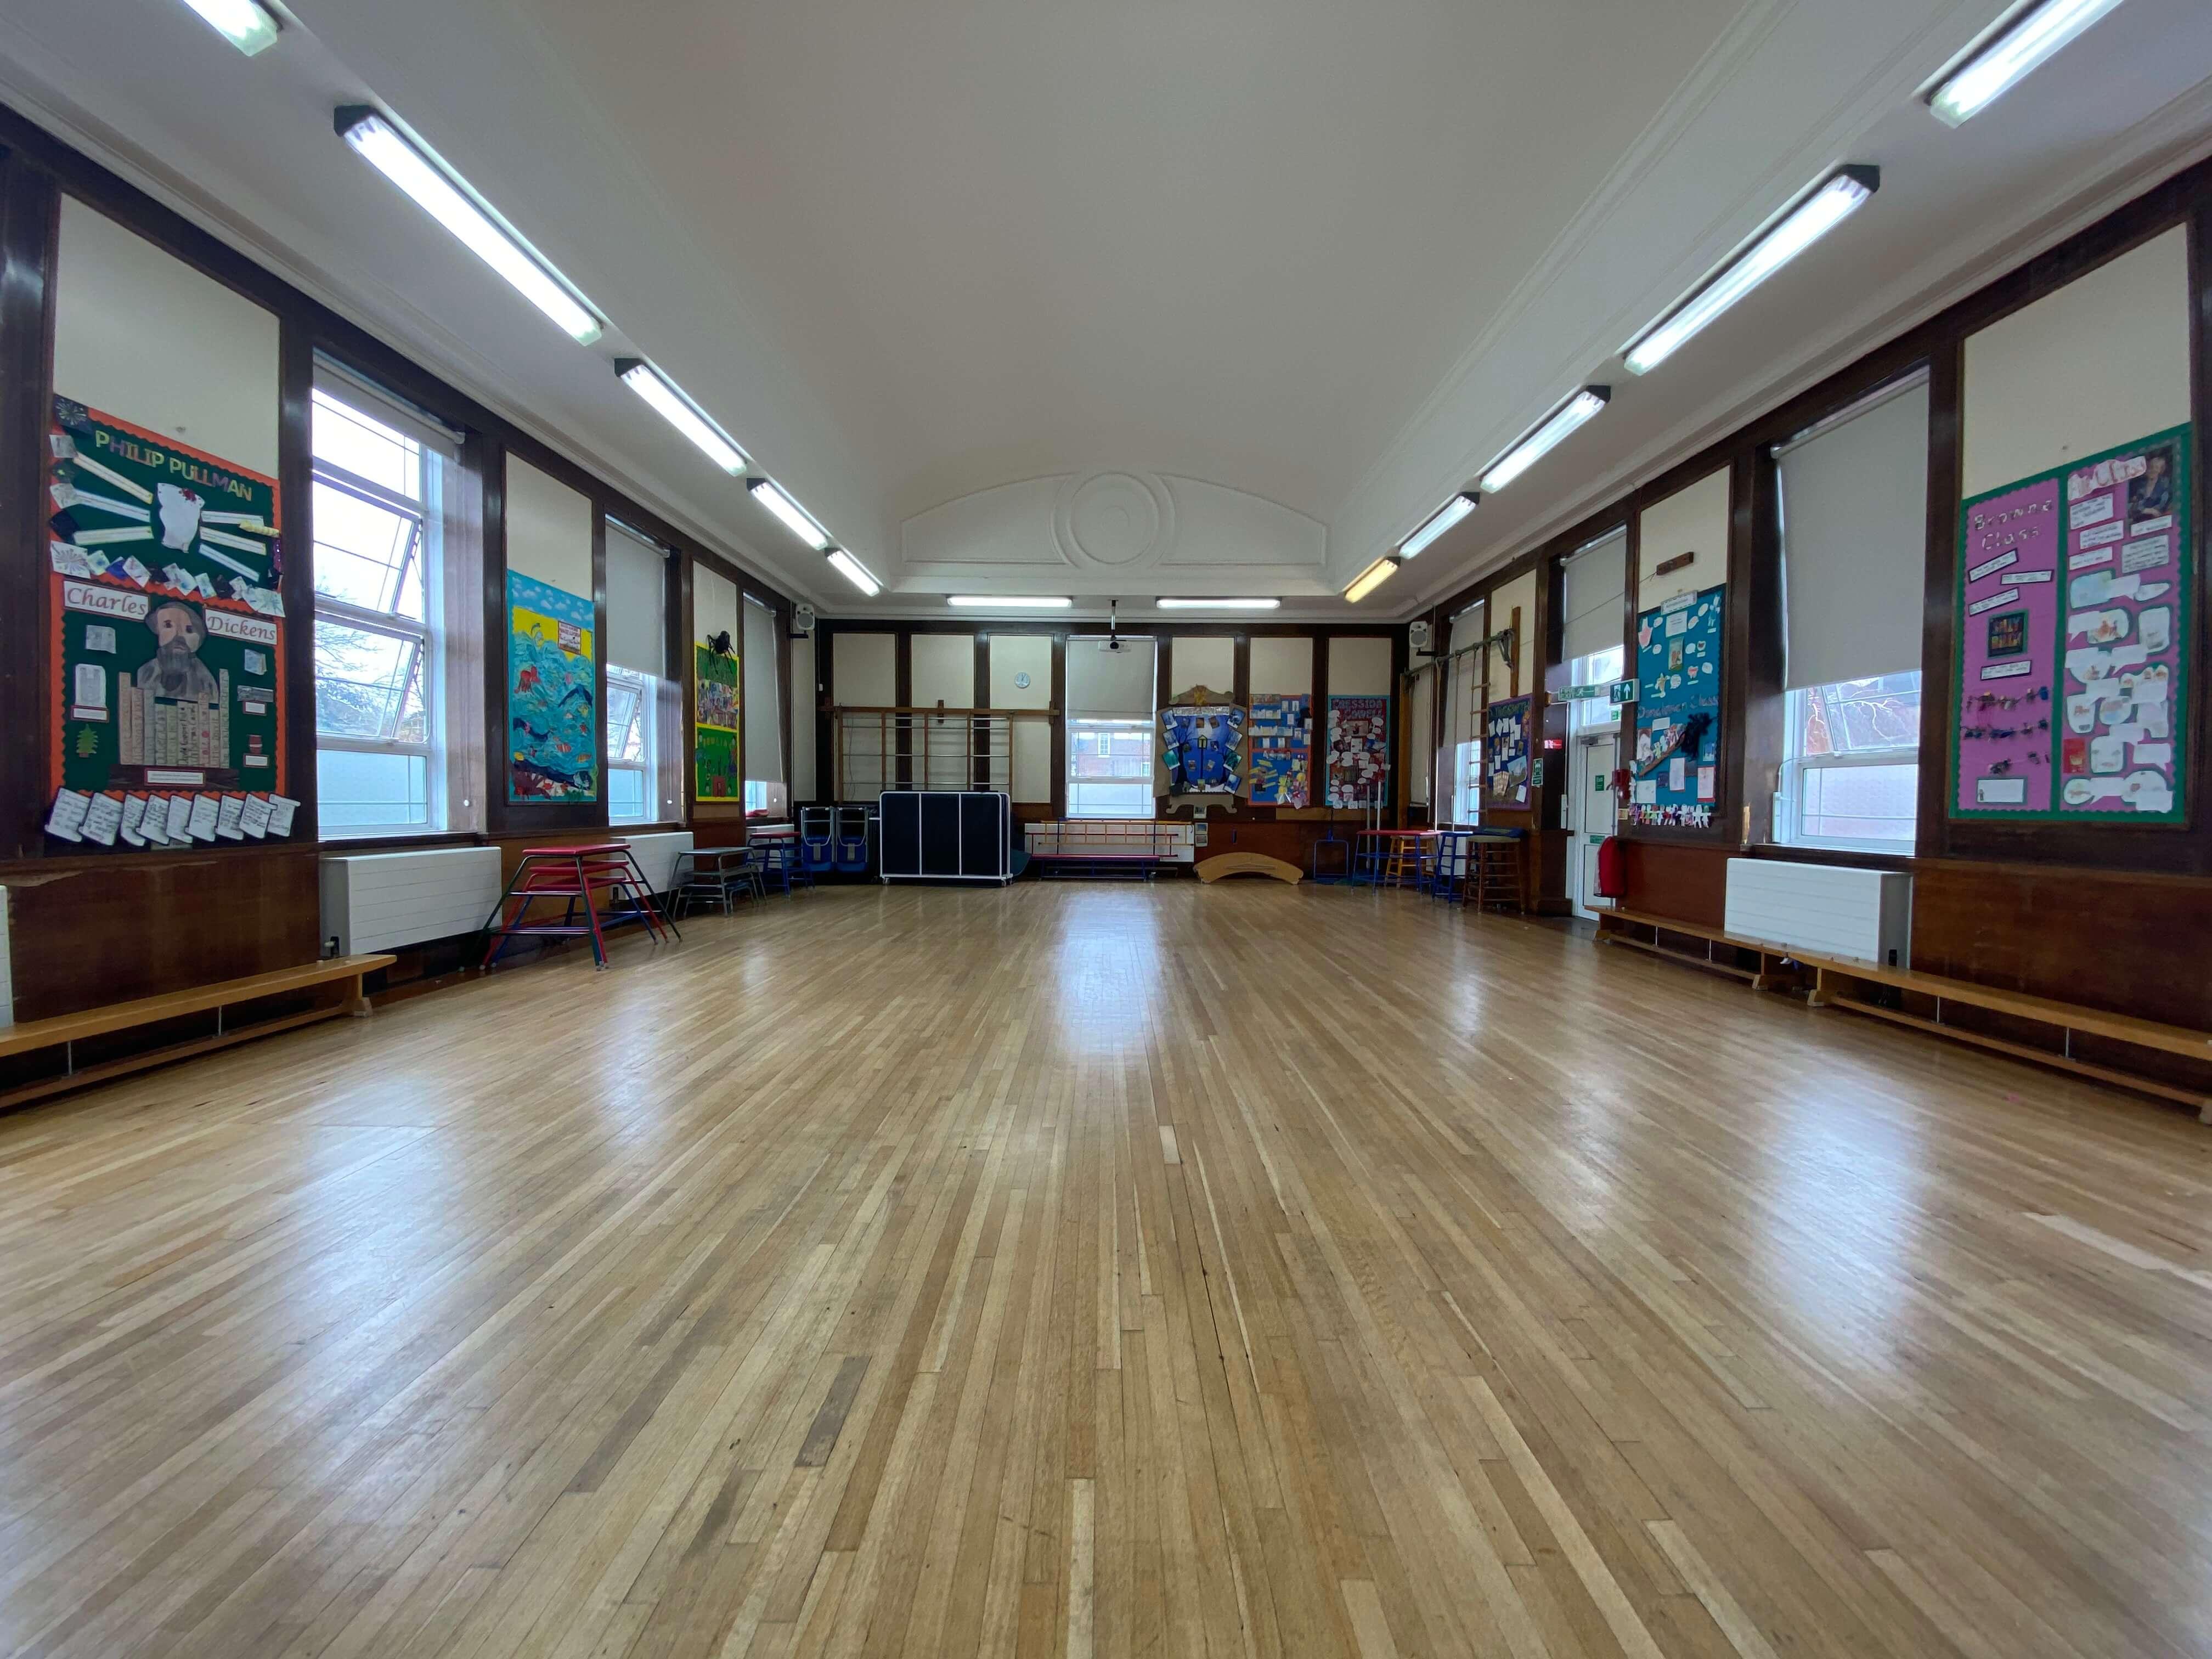 Dollis Primary School Main Hall